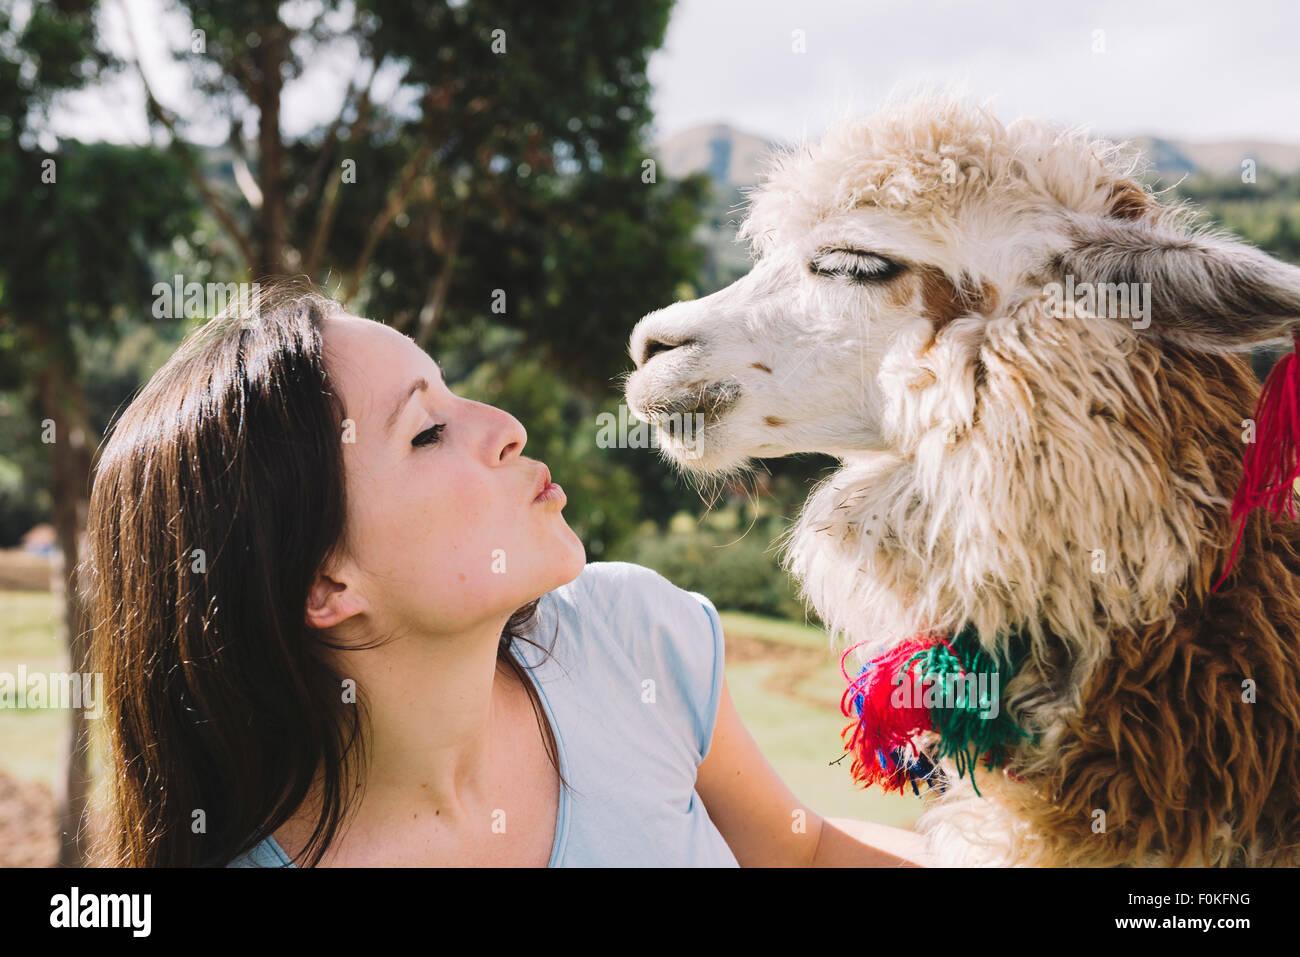 Pérou, Cusco, jeune femme face à face pour un alpaga Photo Stock